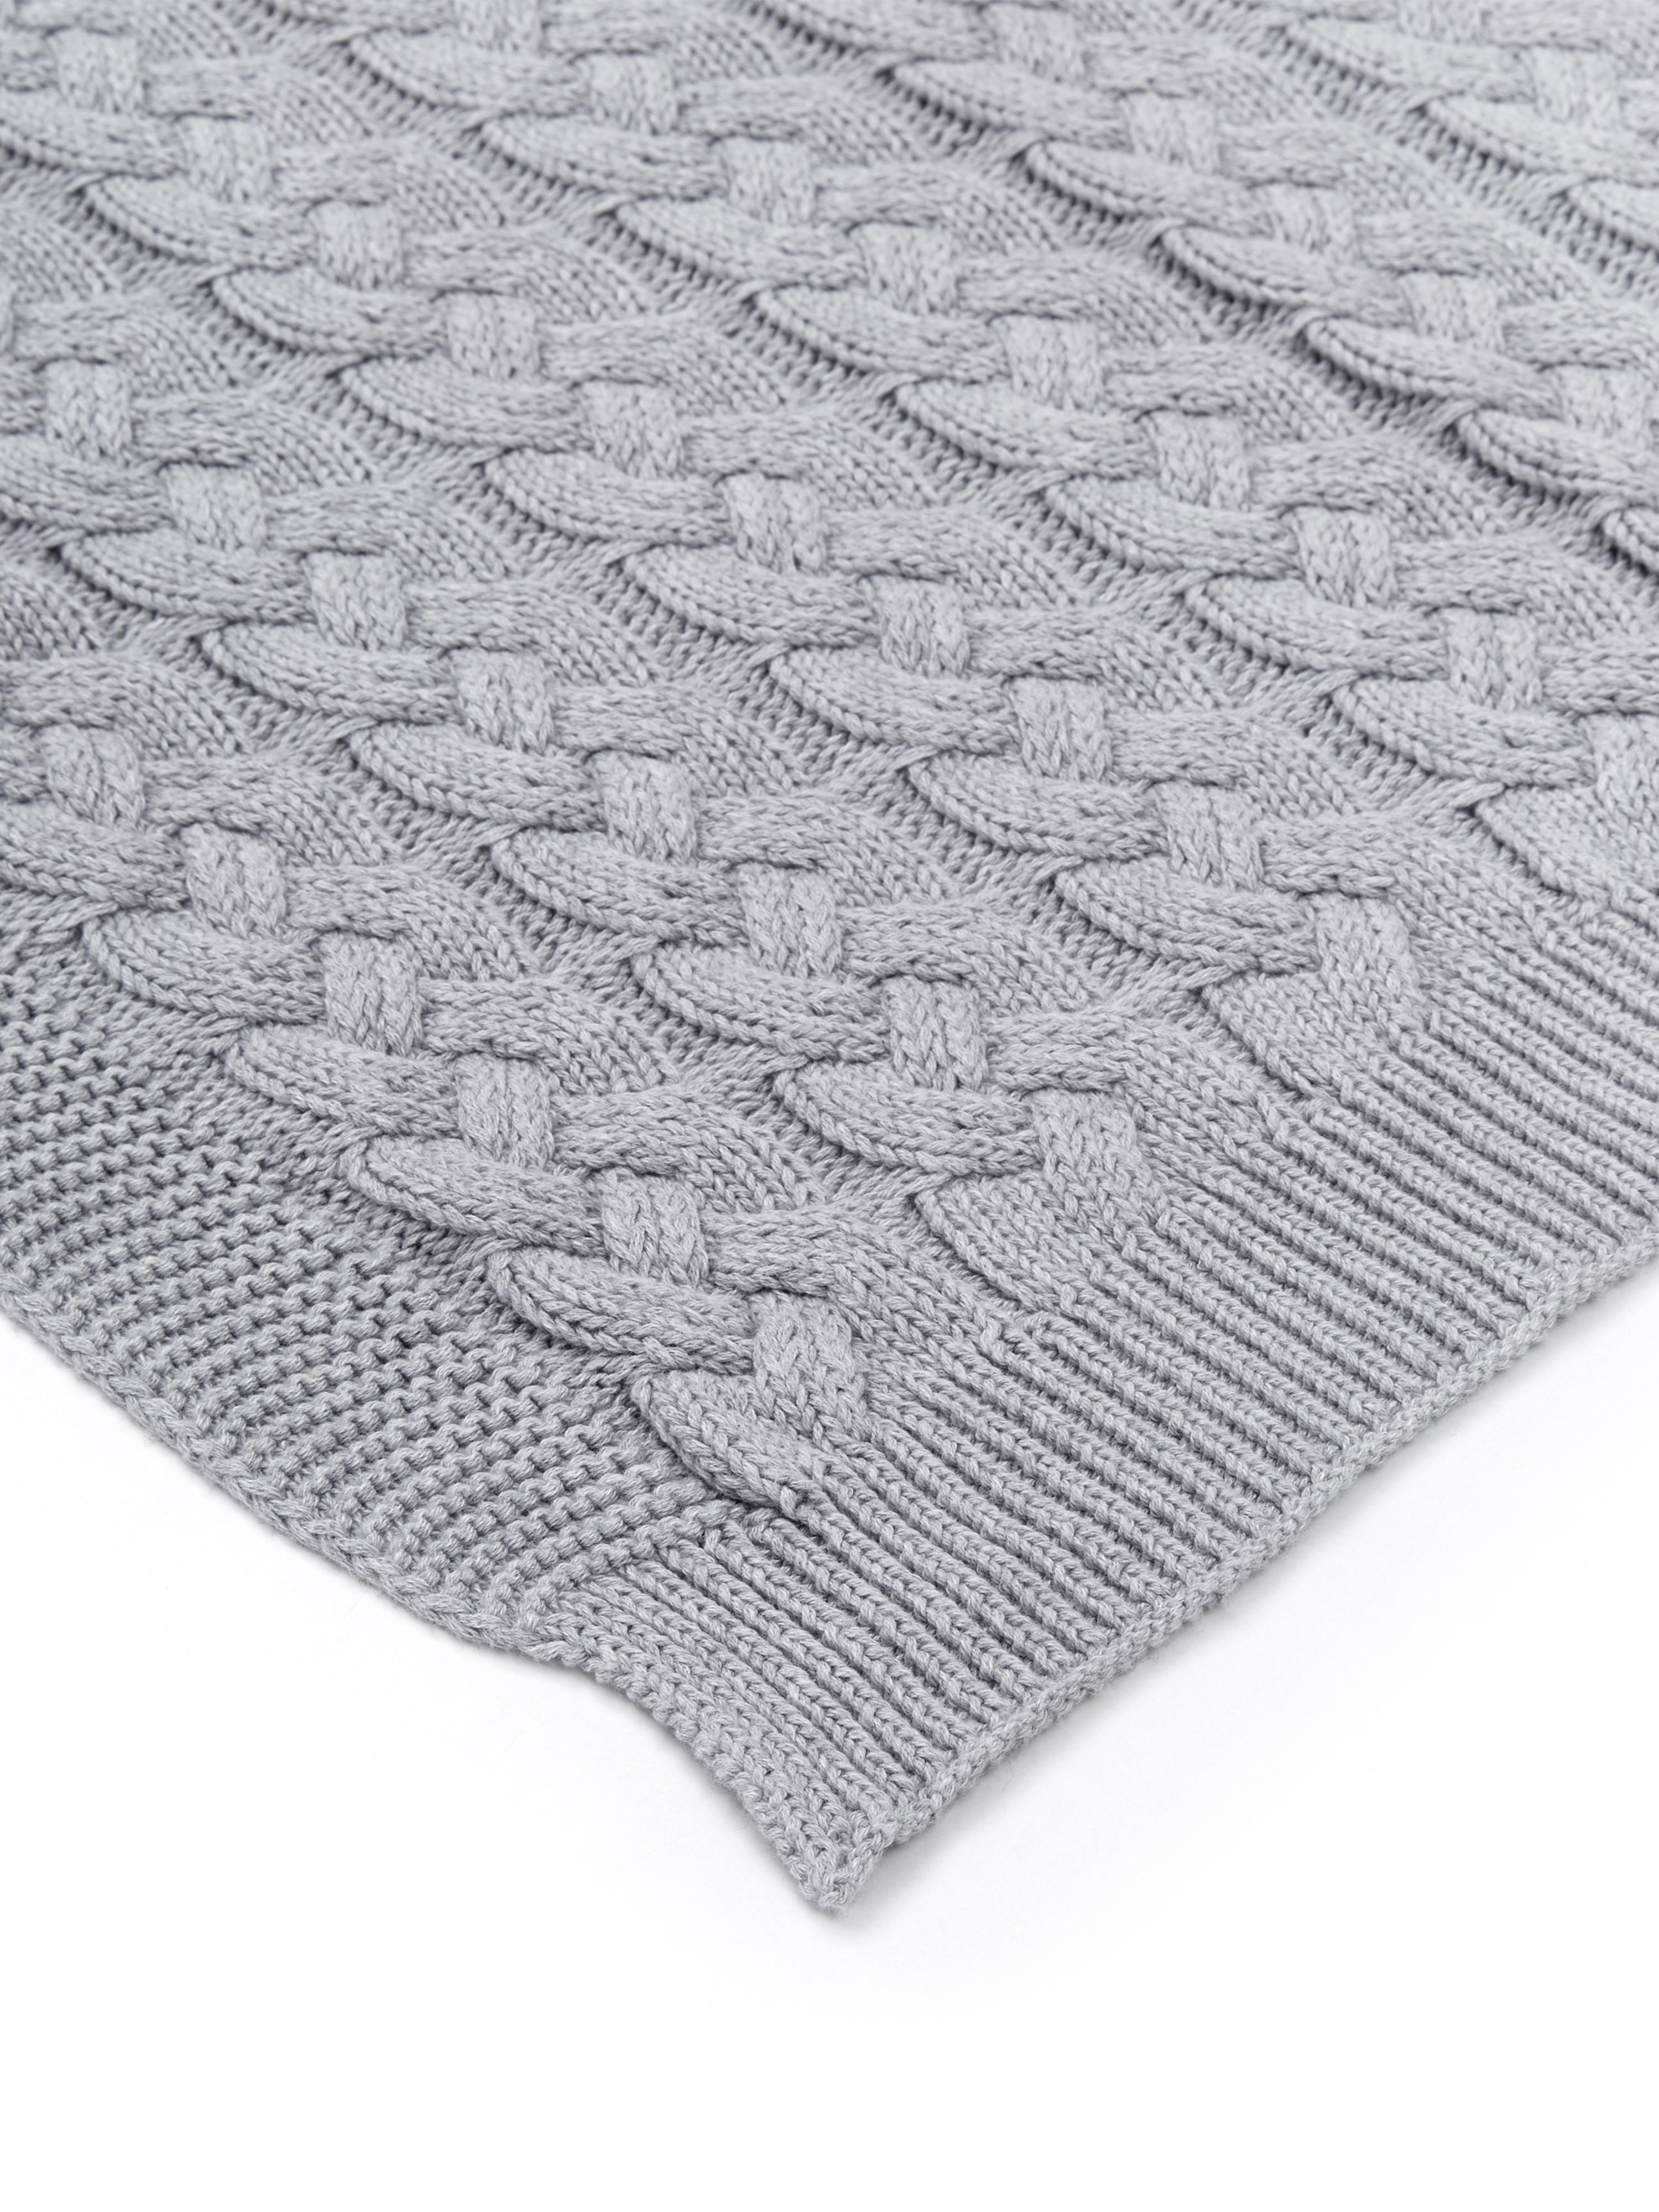 Strick-Plaid Caleb mit Zopfmuster, 100% Baumwolle, Grau, 130 x 170 cm